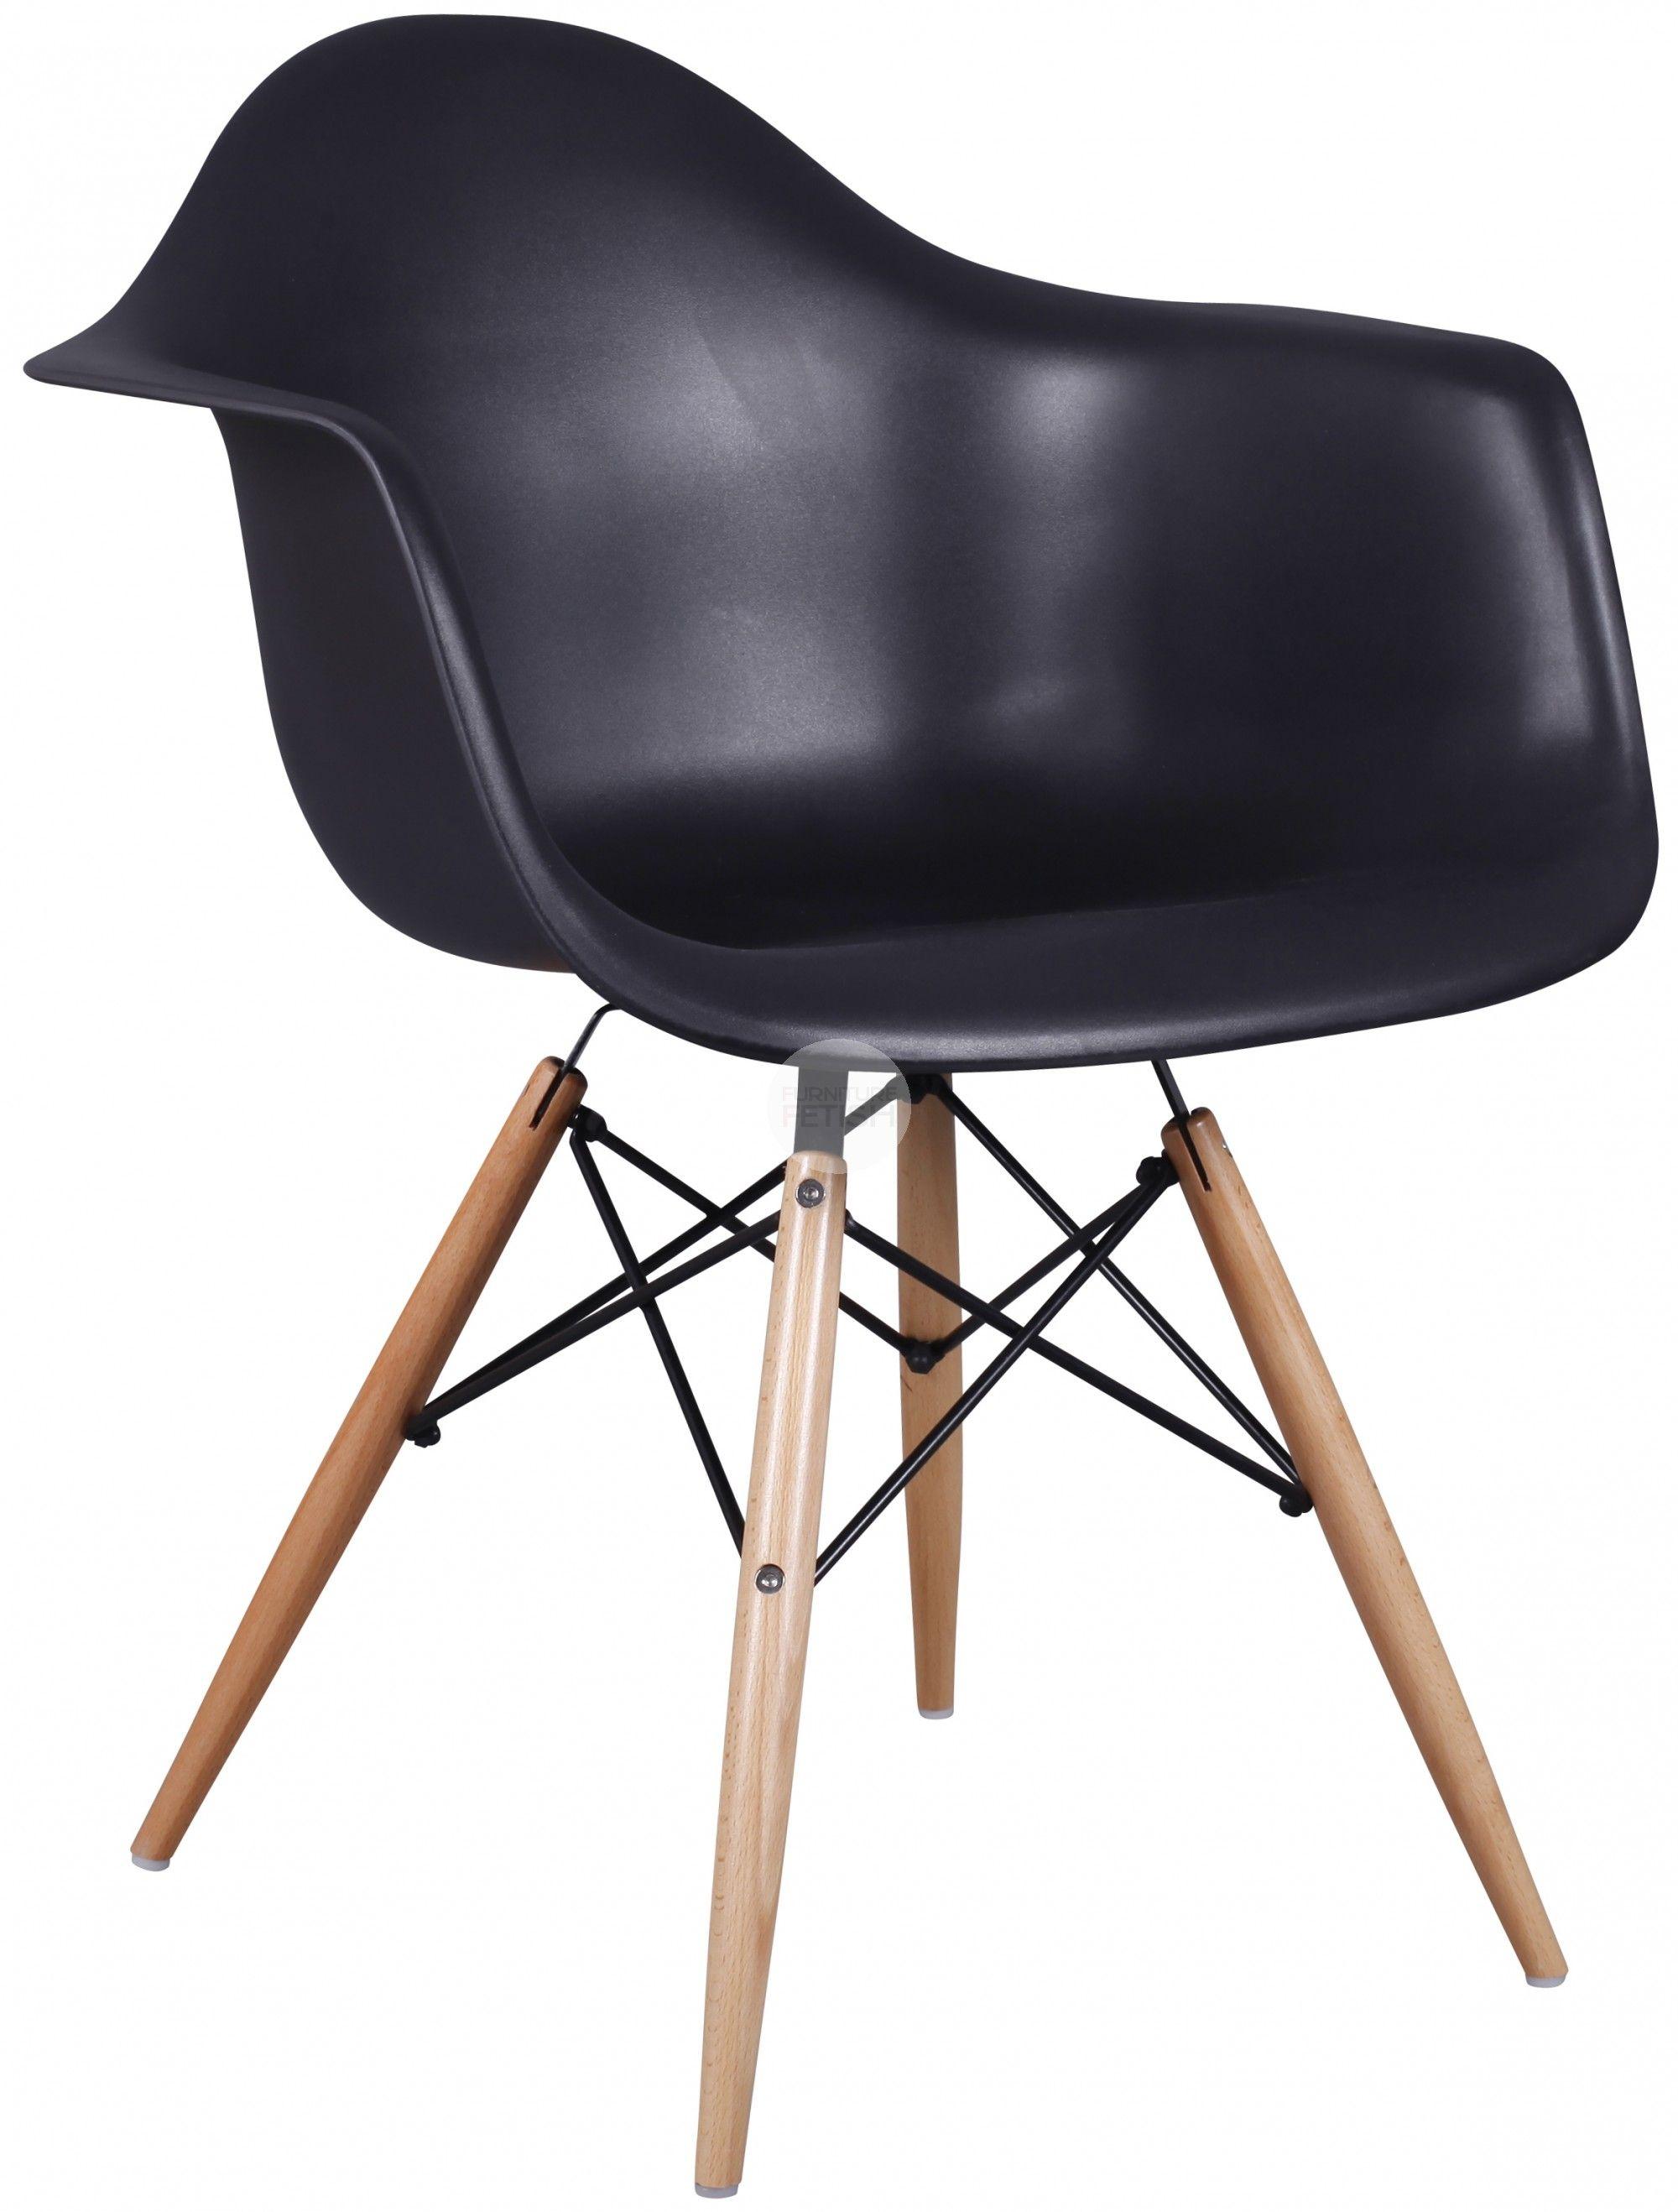 replica eames chair - google search | meeting space 3 | pinterest